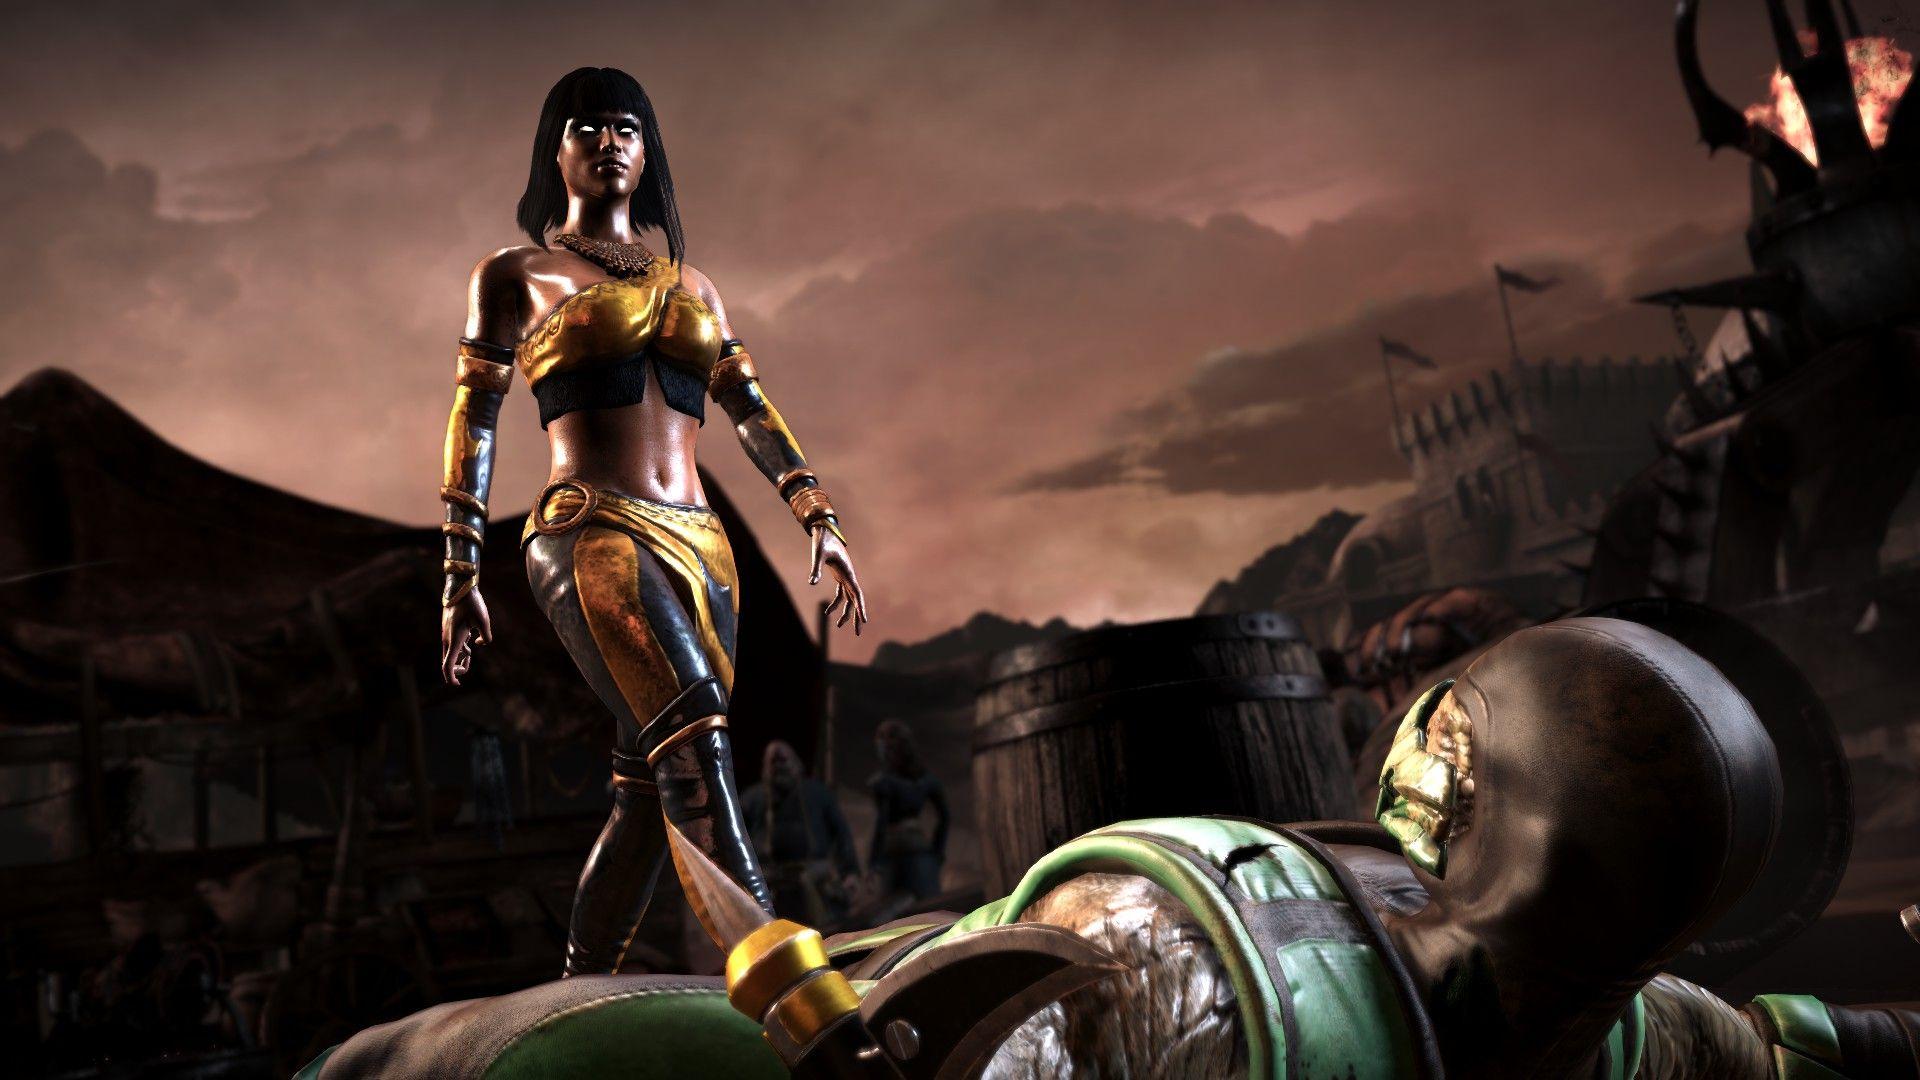 Tanya Dlc Fatality Screenshot Mortal Kombat X By The Nothing